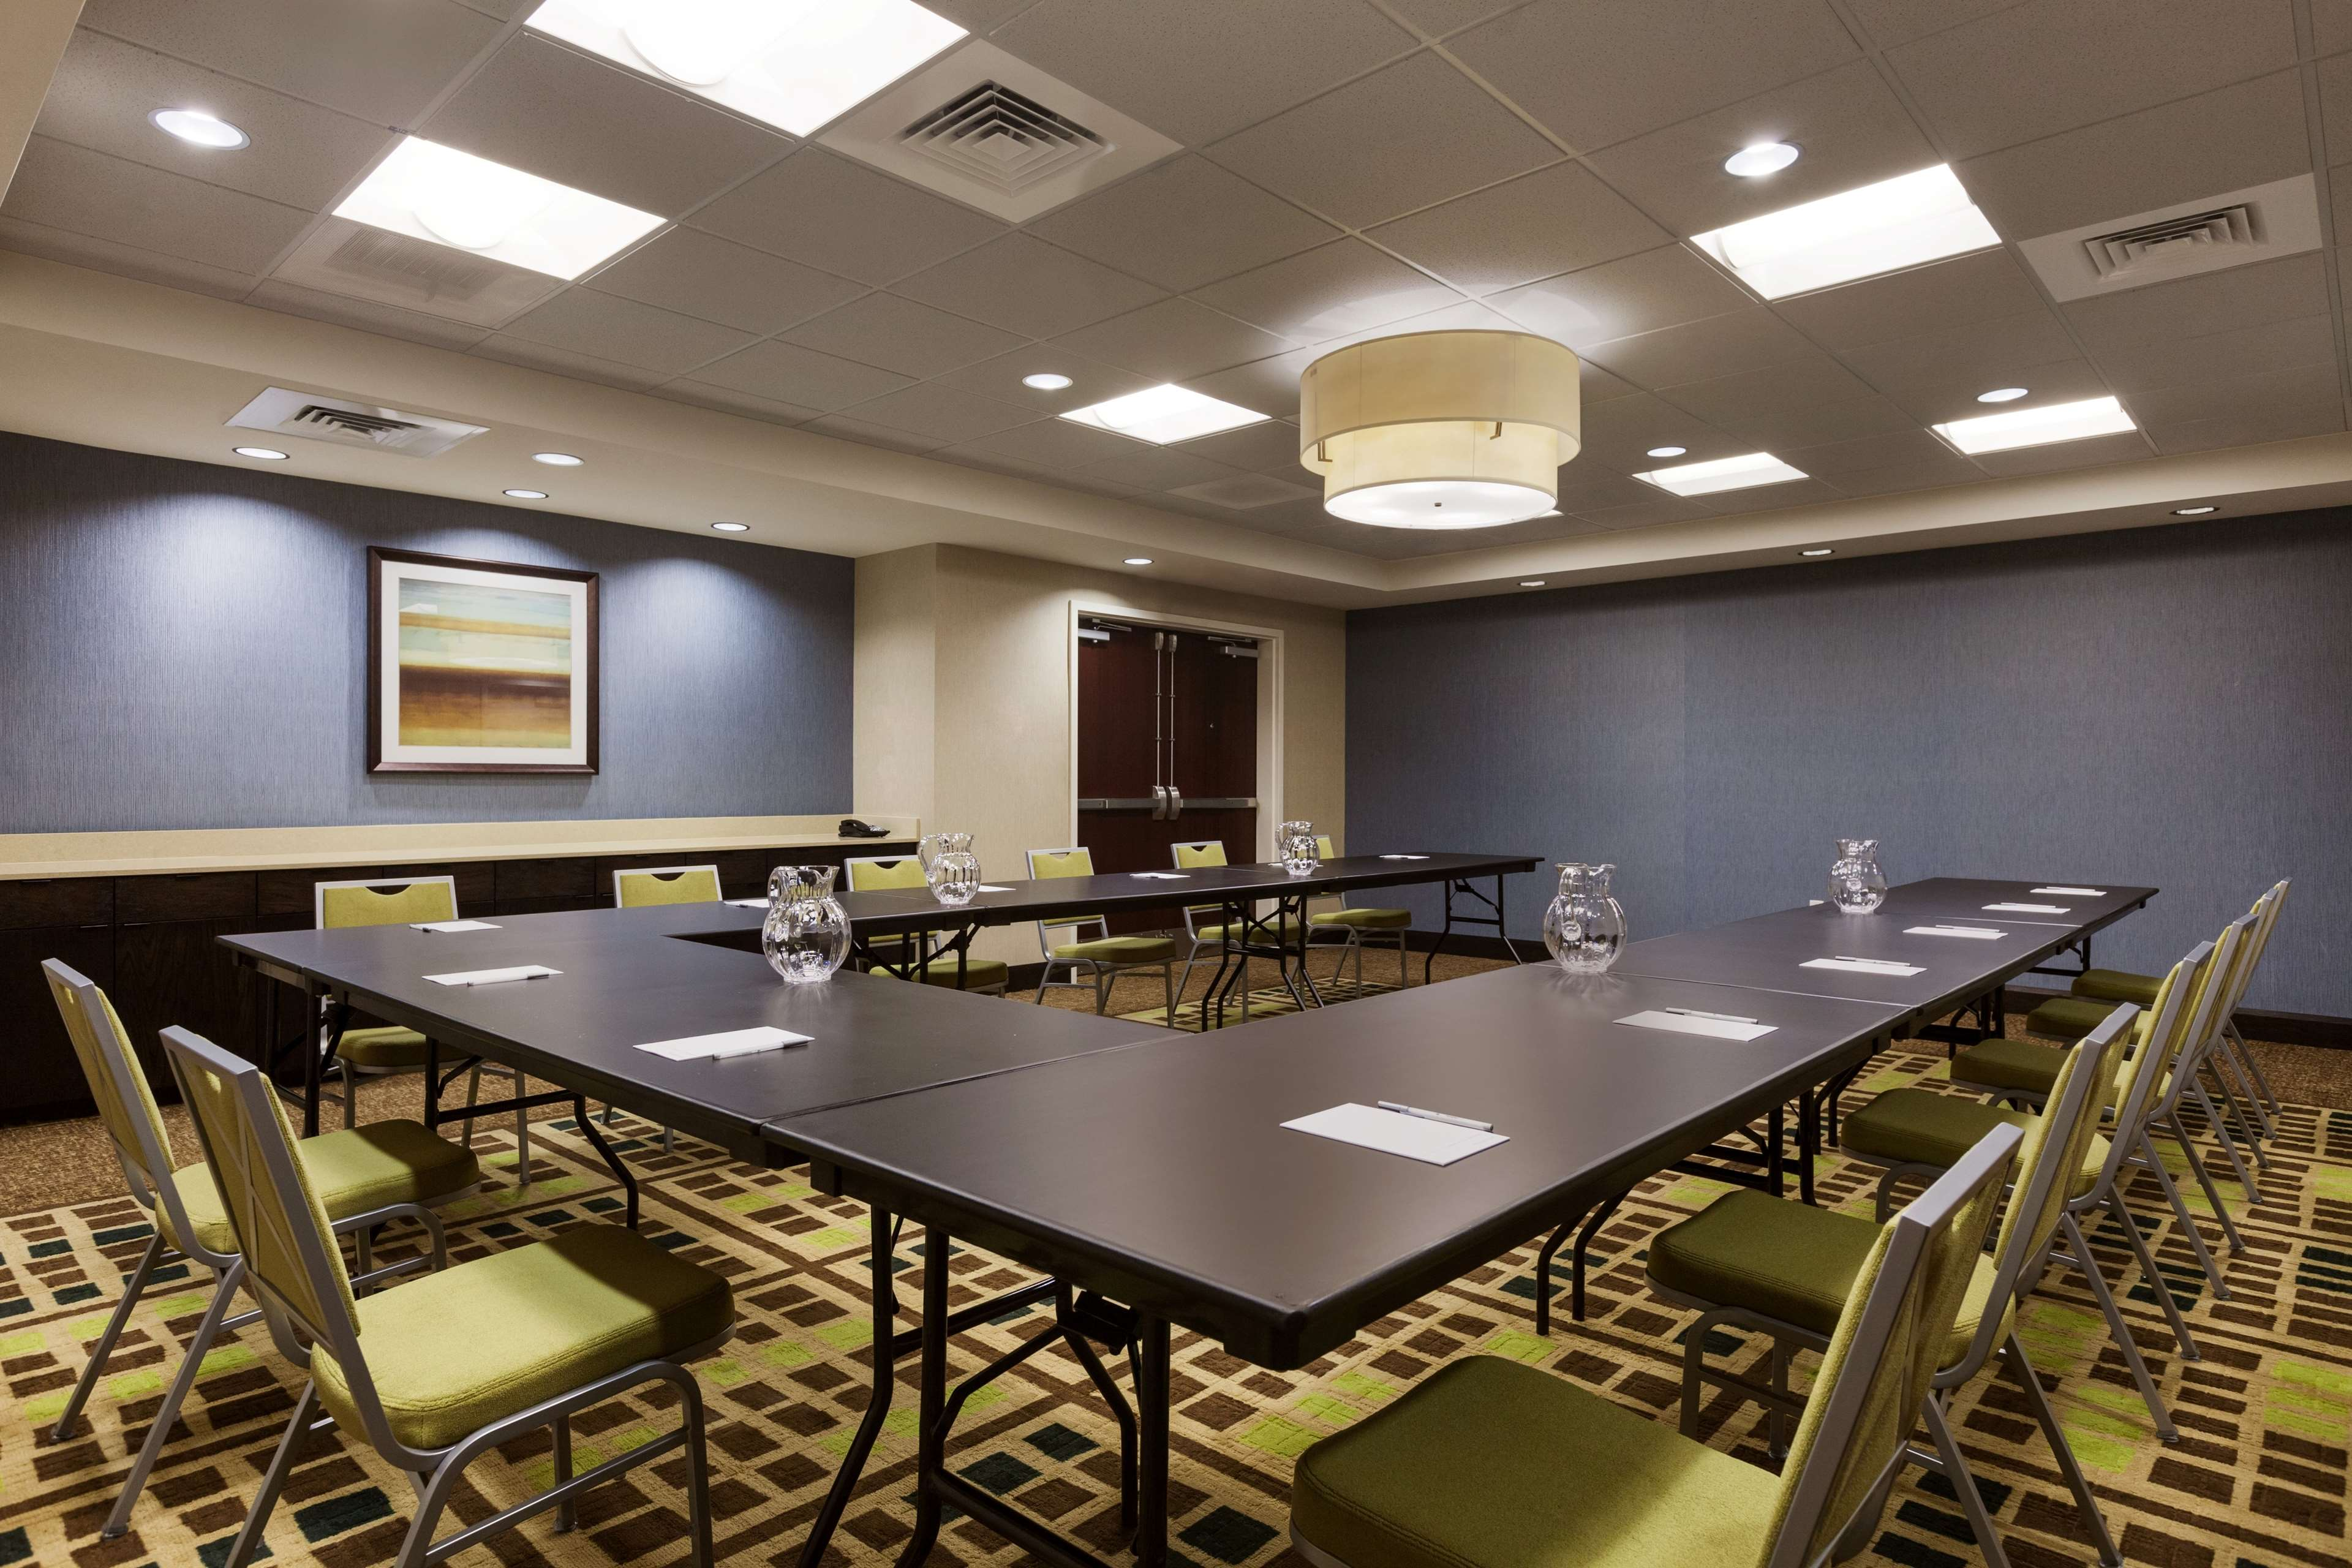 Hampton Inn & Suites Camp Springs/Andrews AFB image 13